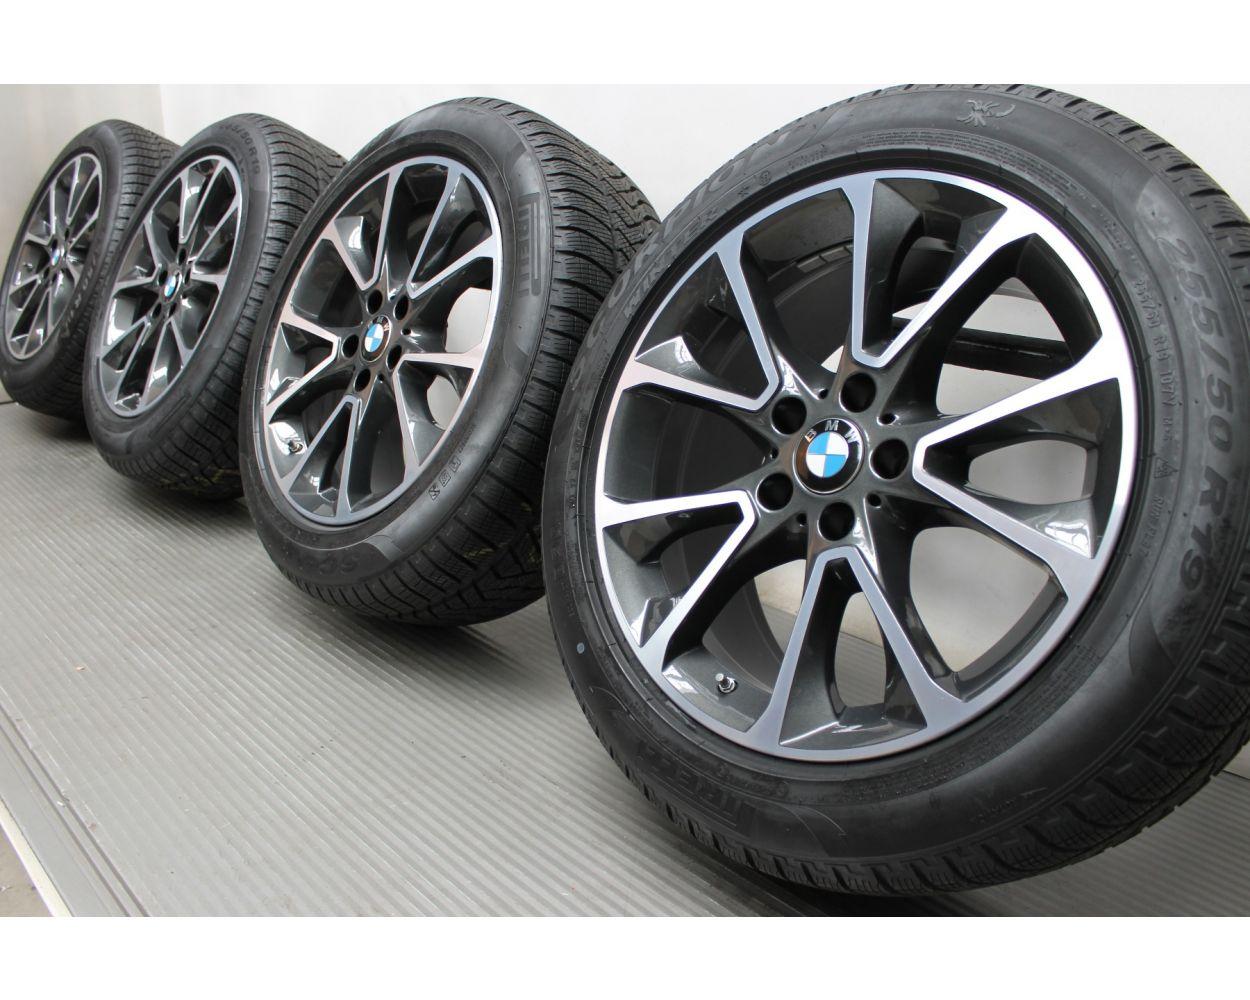 Bmw Winter Wheels X5 F15 19 Zoll 449 Star Spoke Rdc Bicolor